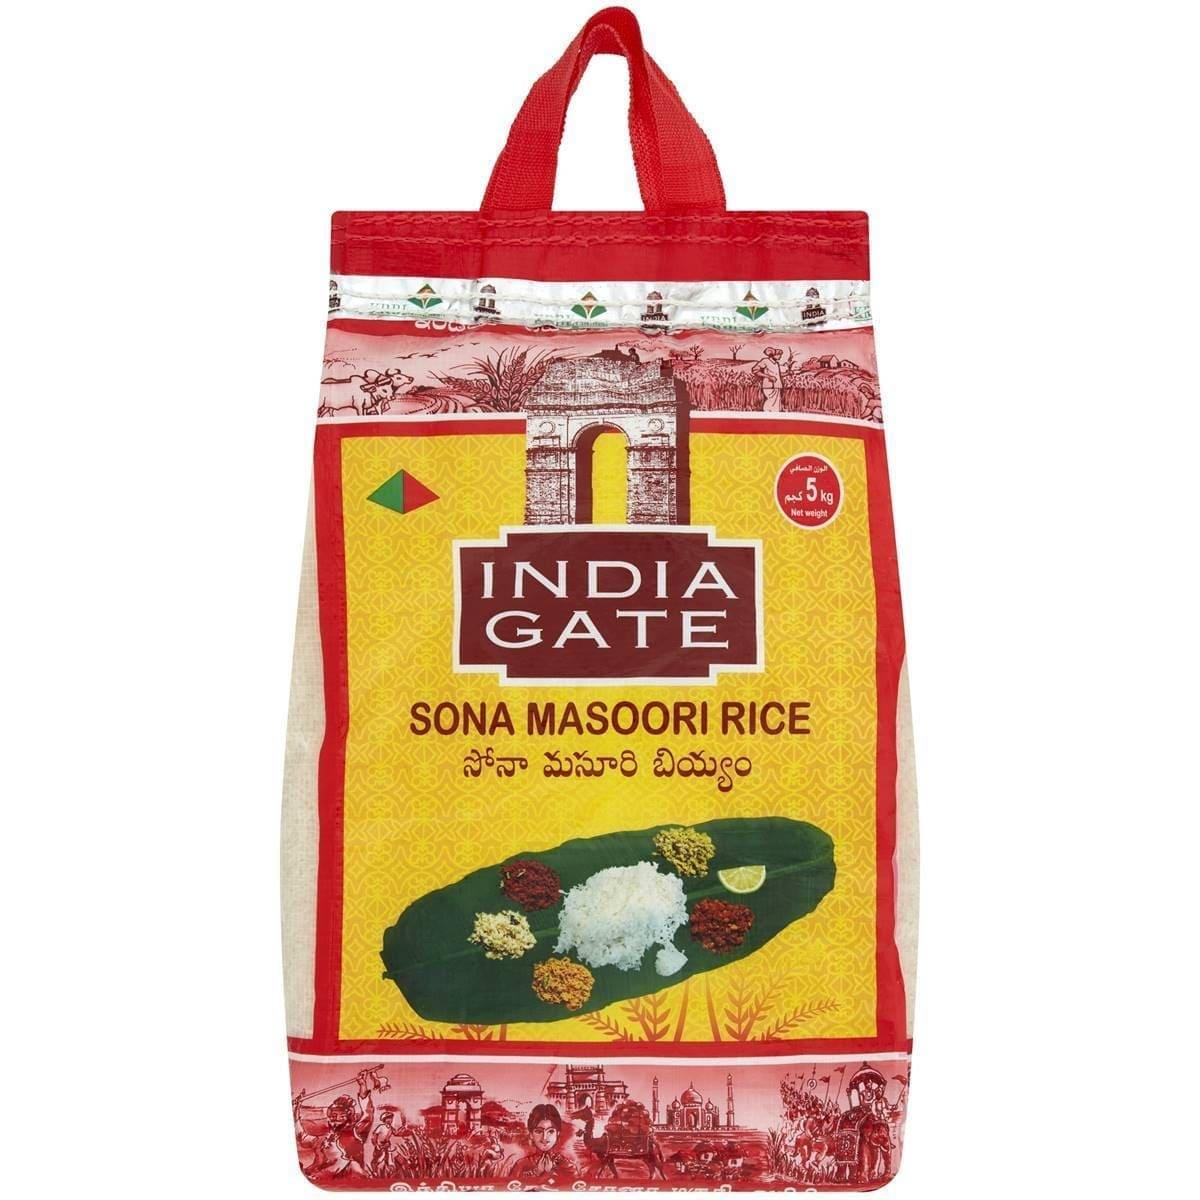 sona masoori rice 5kg by india gate brand